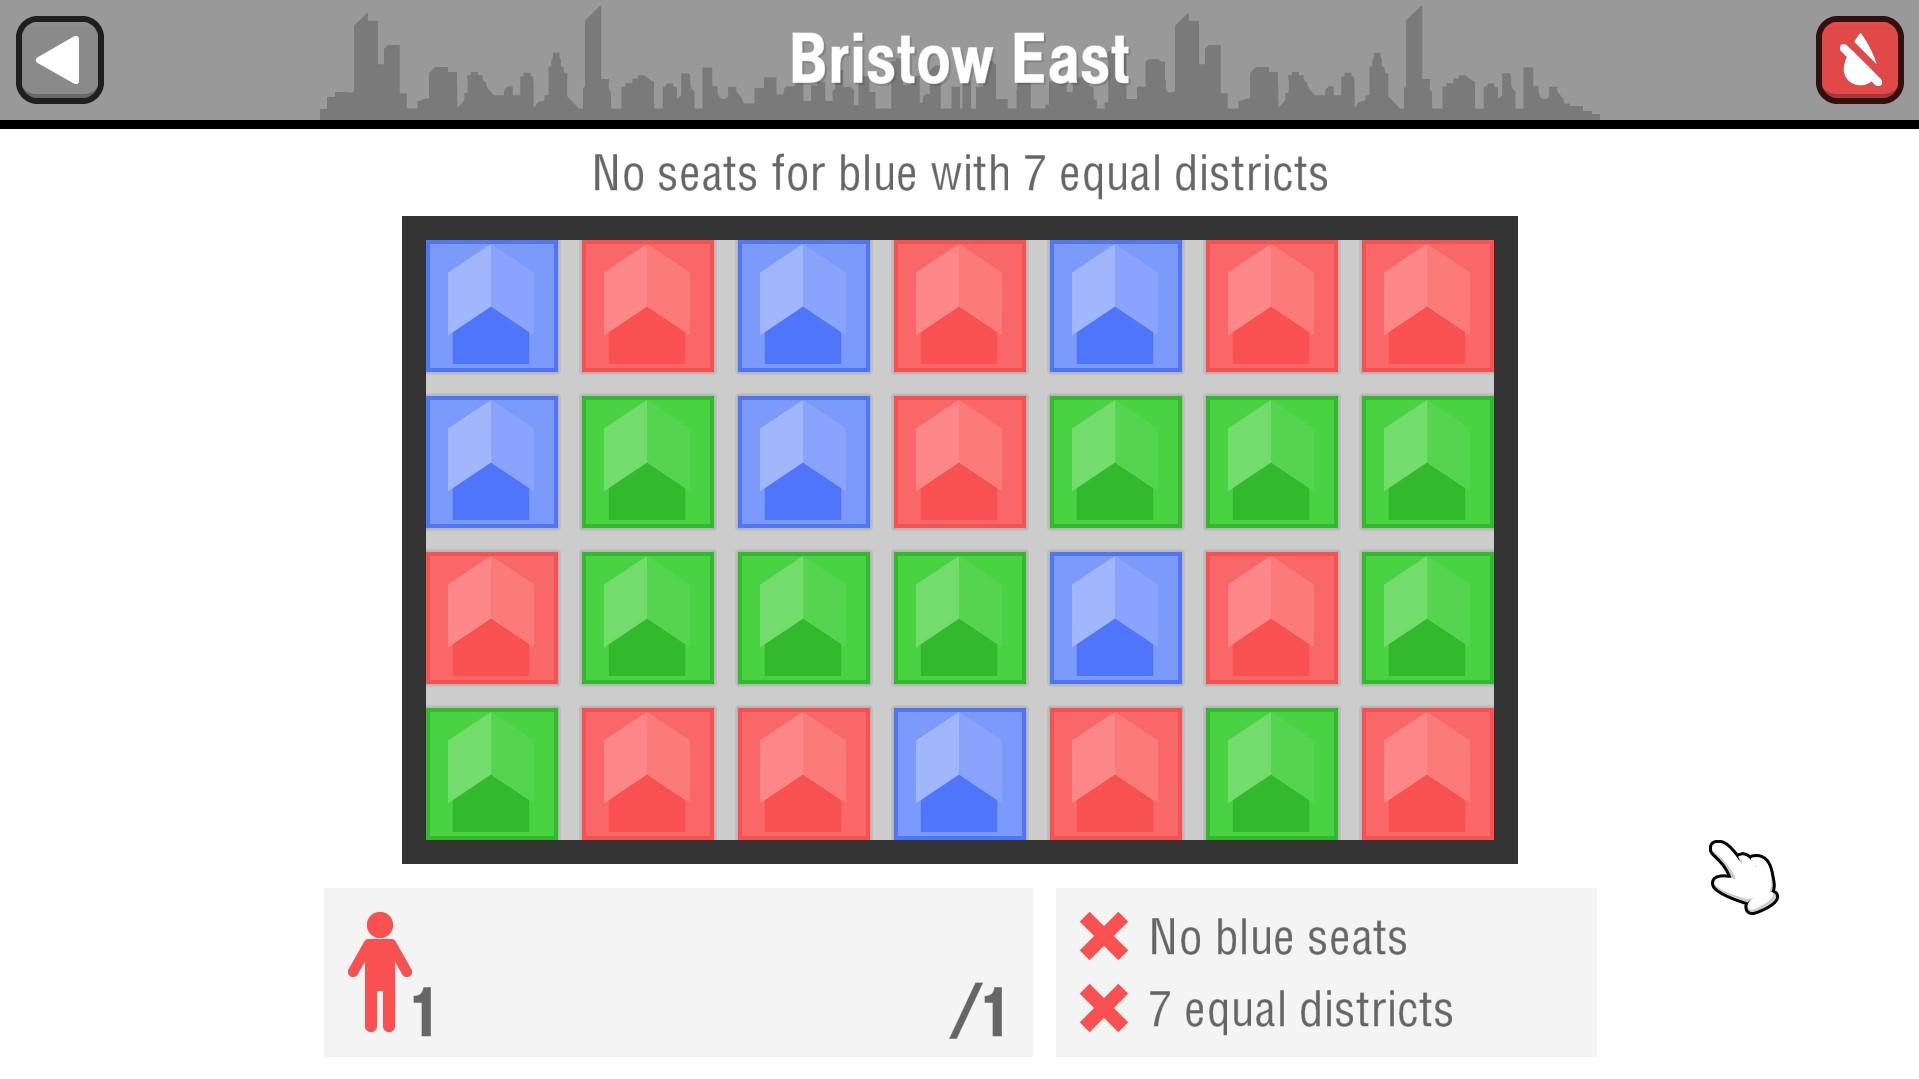 Bristow East